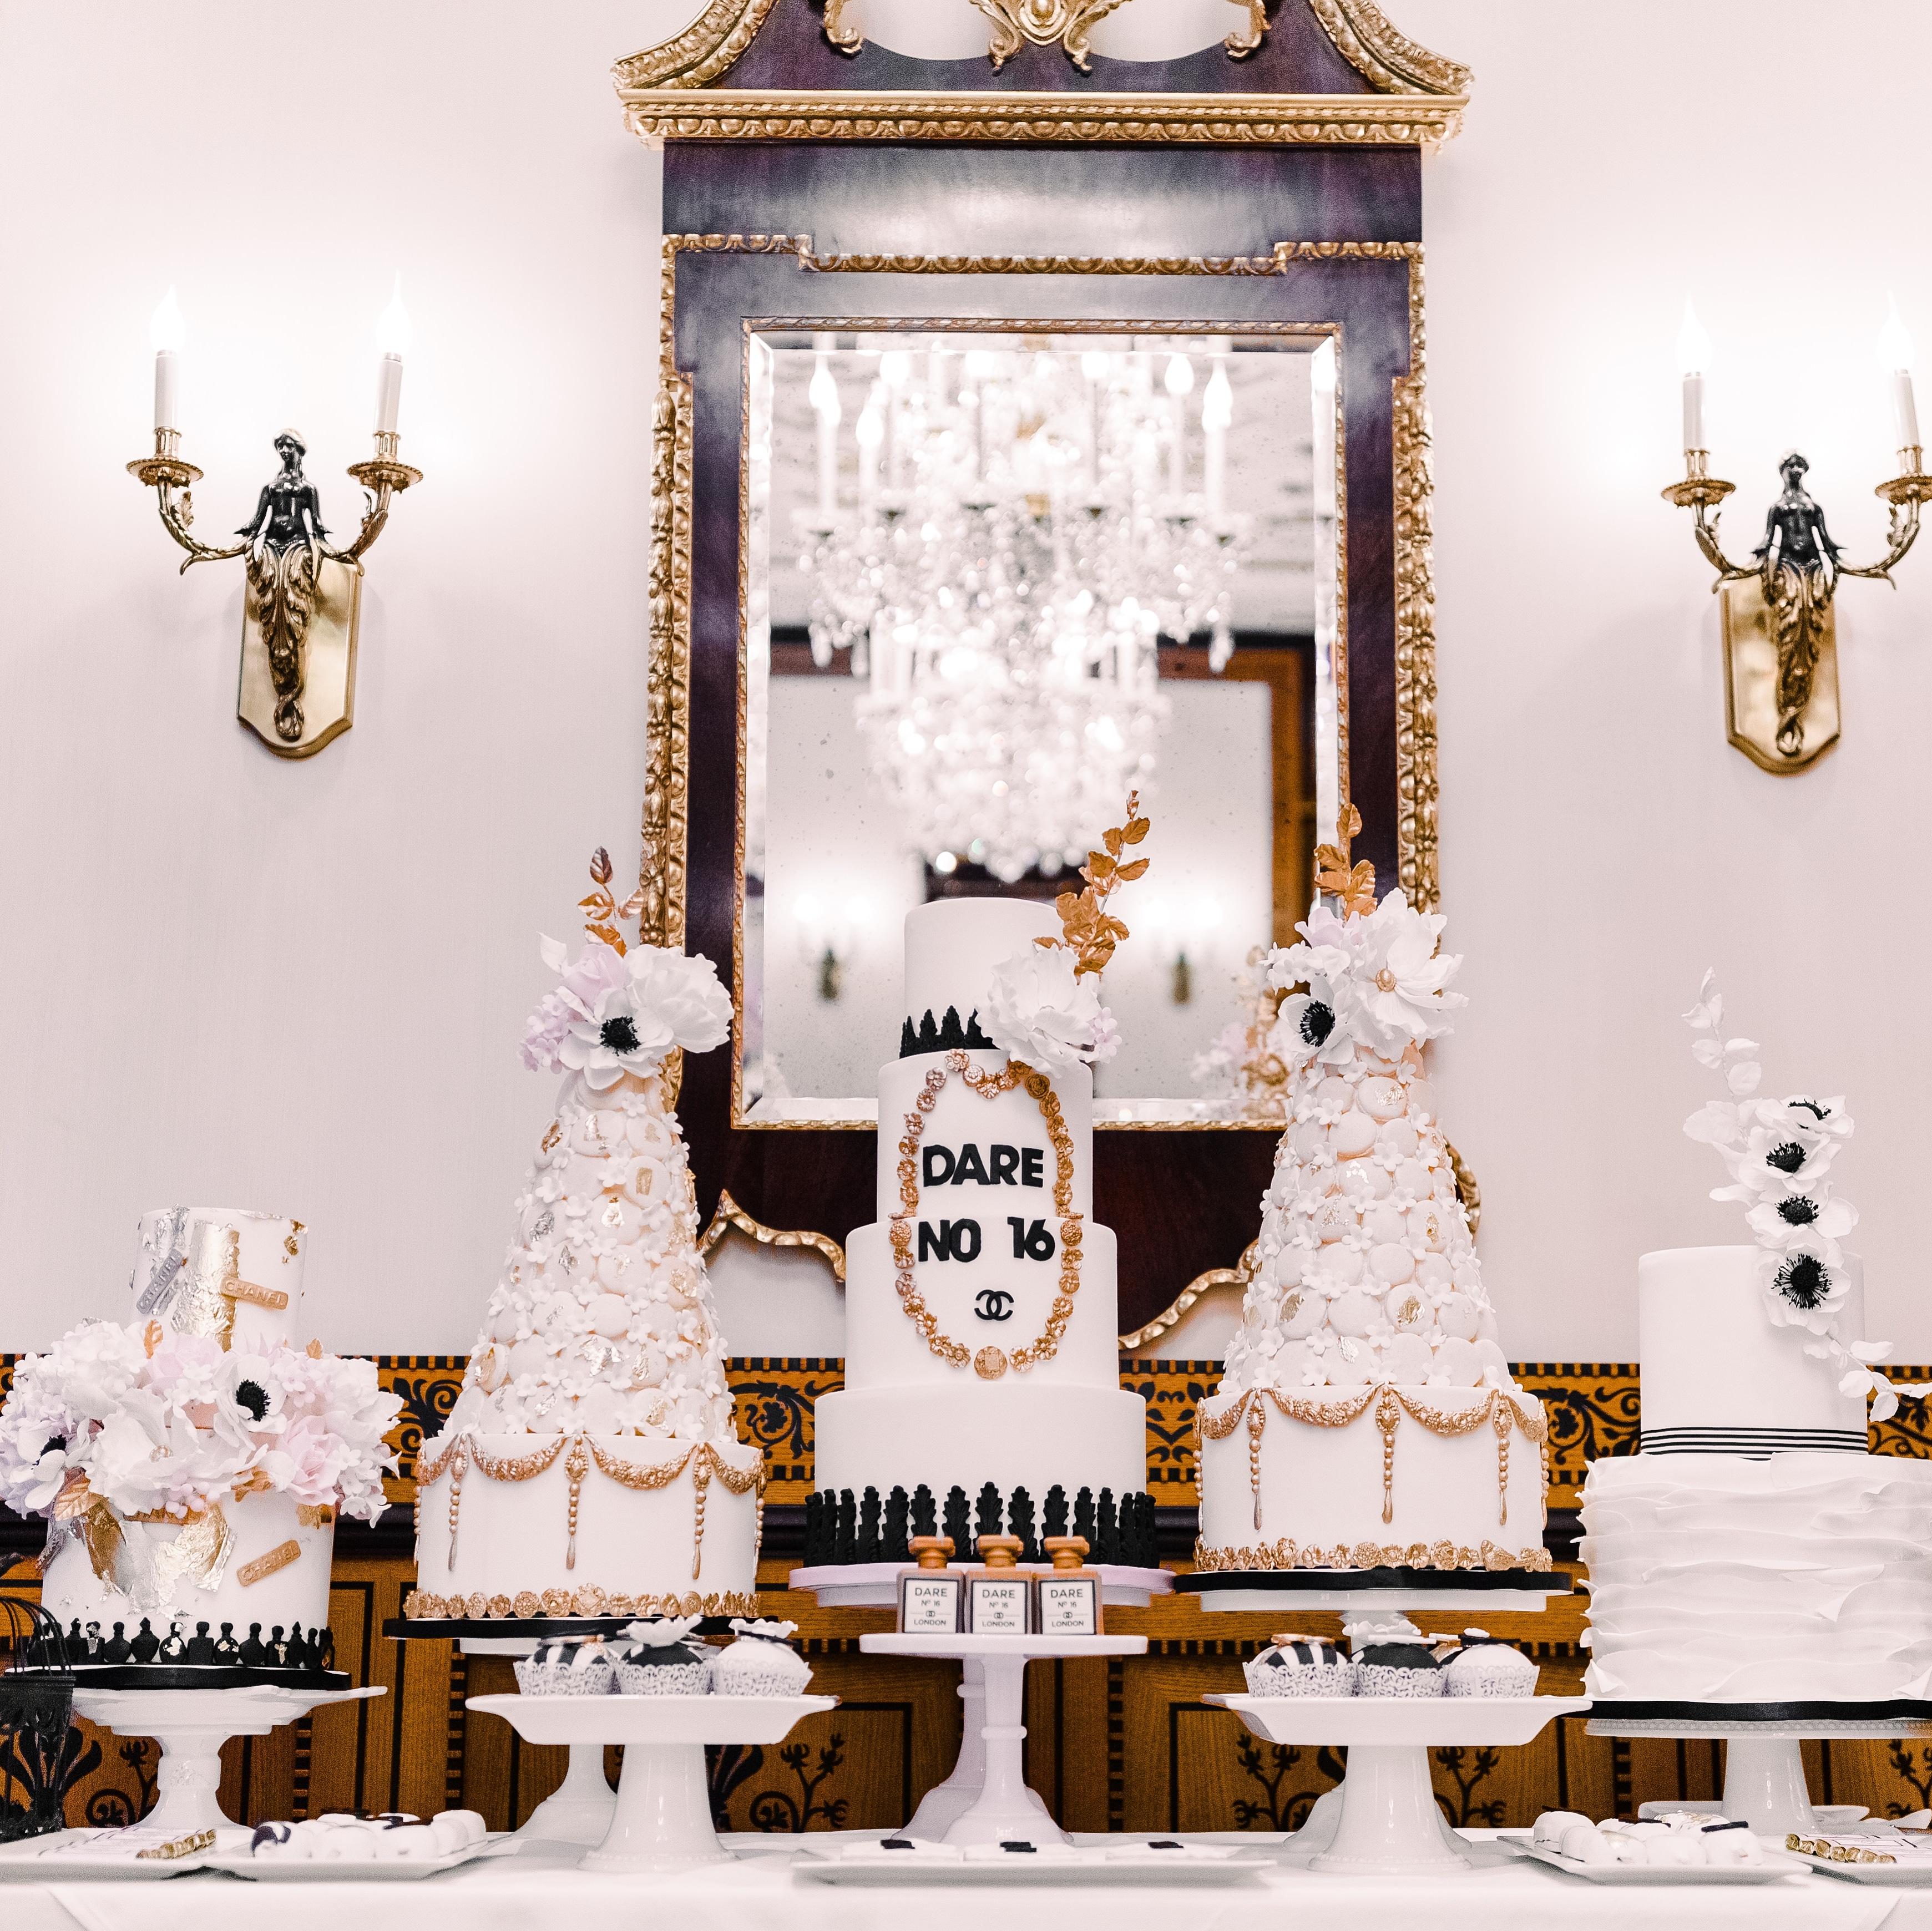 chanel-cake-tabke